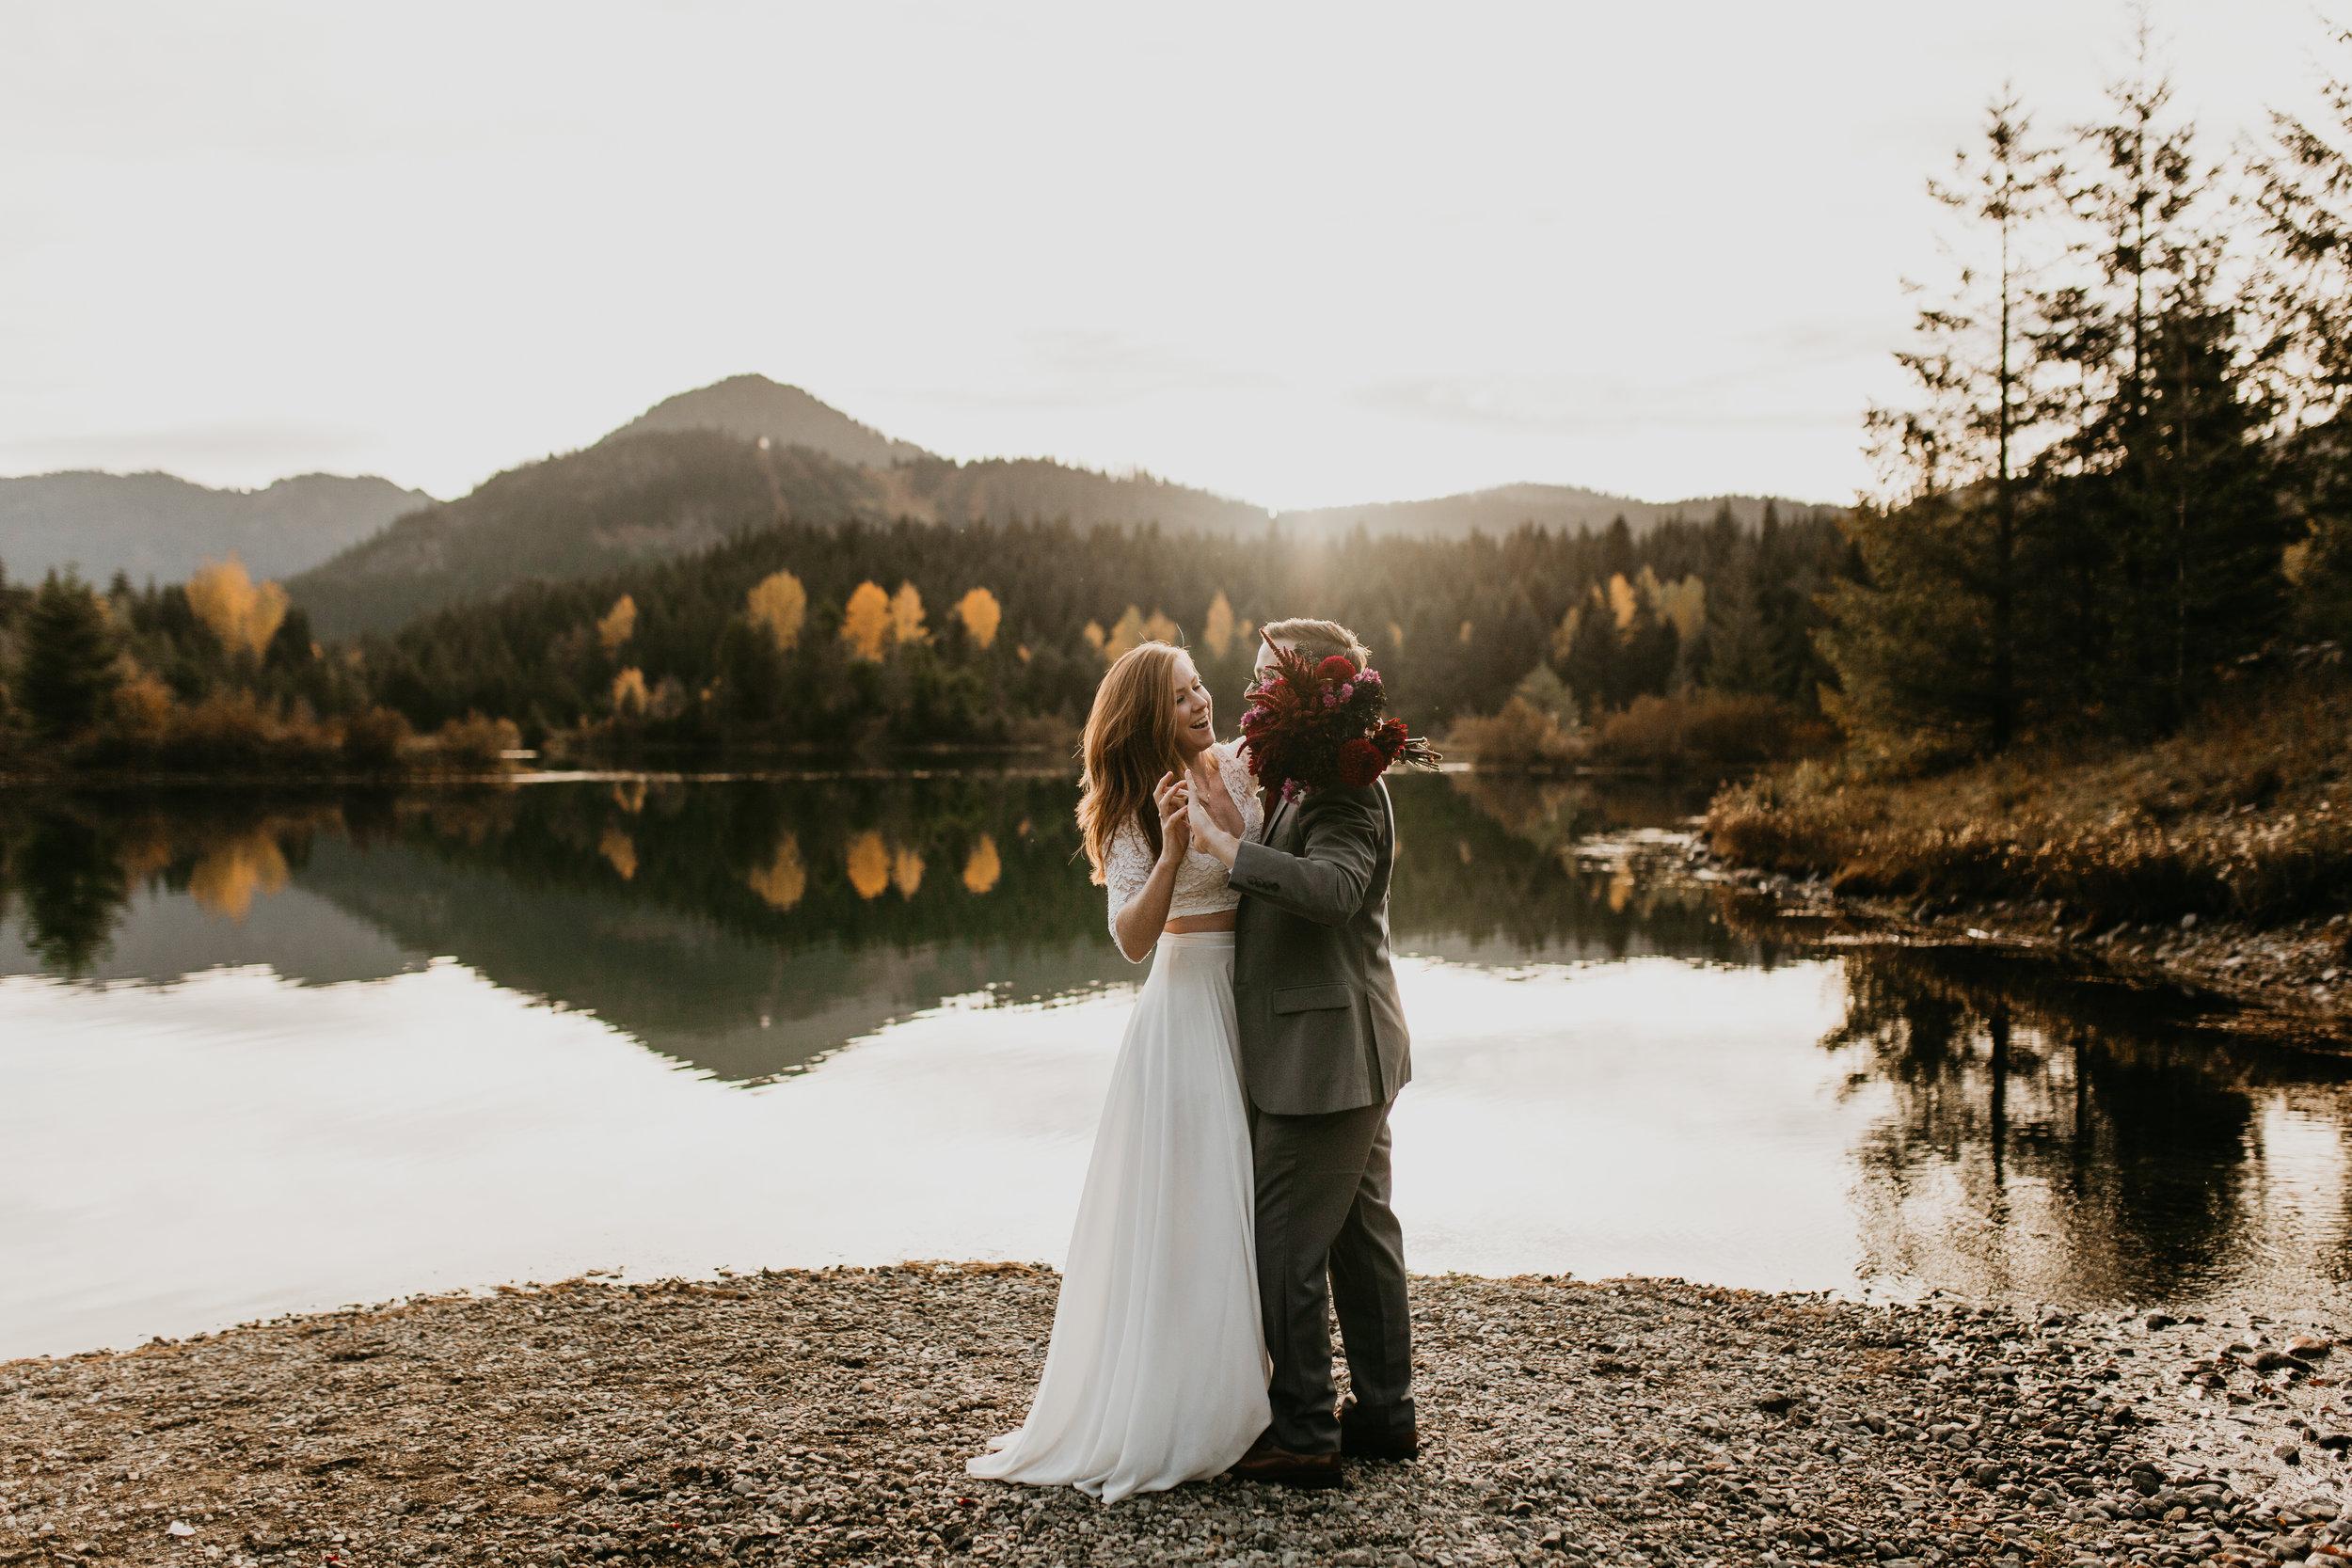 nicole-daacke-photography-mountain-view-elopement-at-gold-creek-pond-snoqualmie-washington-wa-elopement-photographer-photography-adventure-elopement-in-washington-fall-lakeside-golden-sunset-boho-fun-bride-0392.jpg